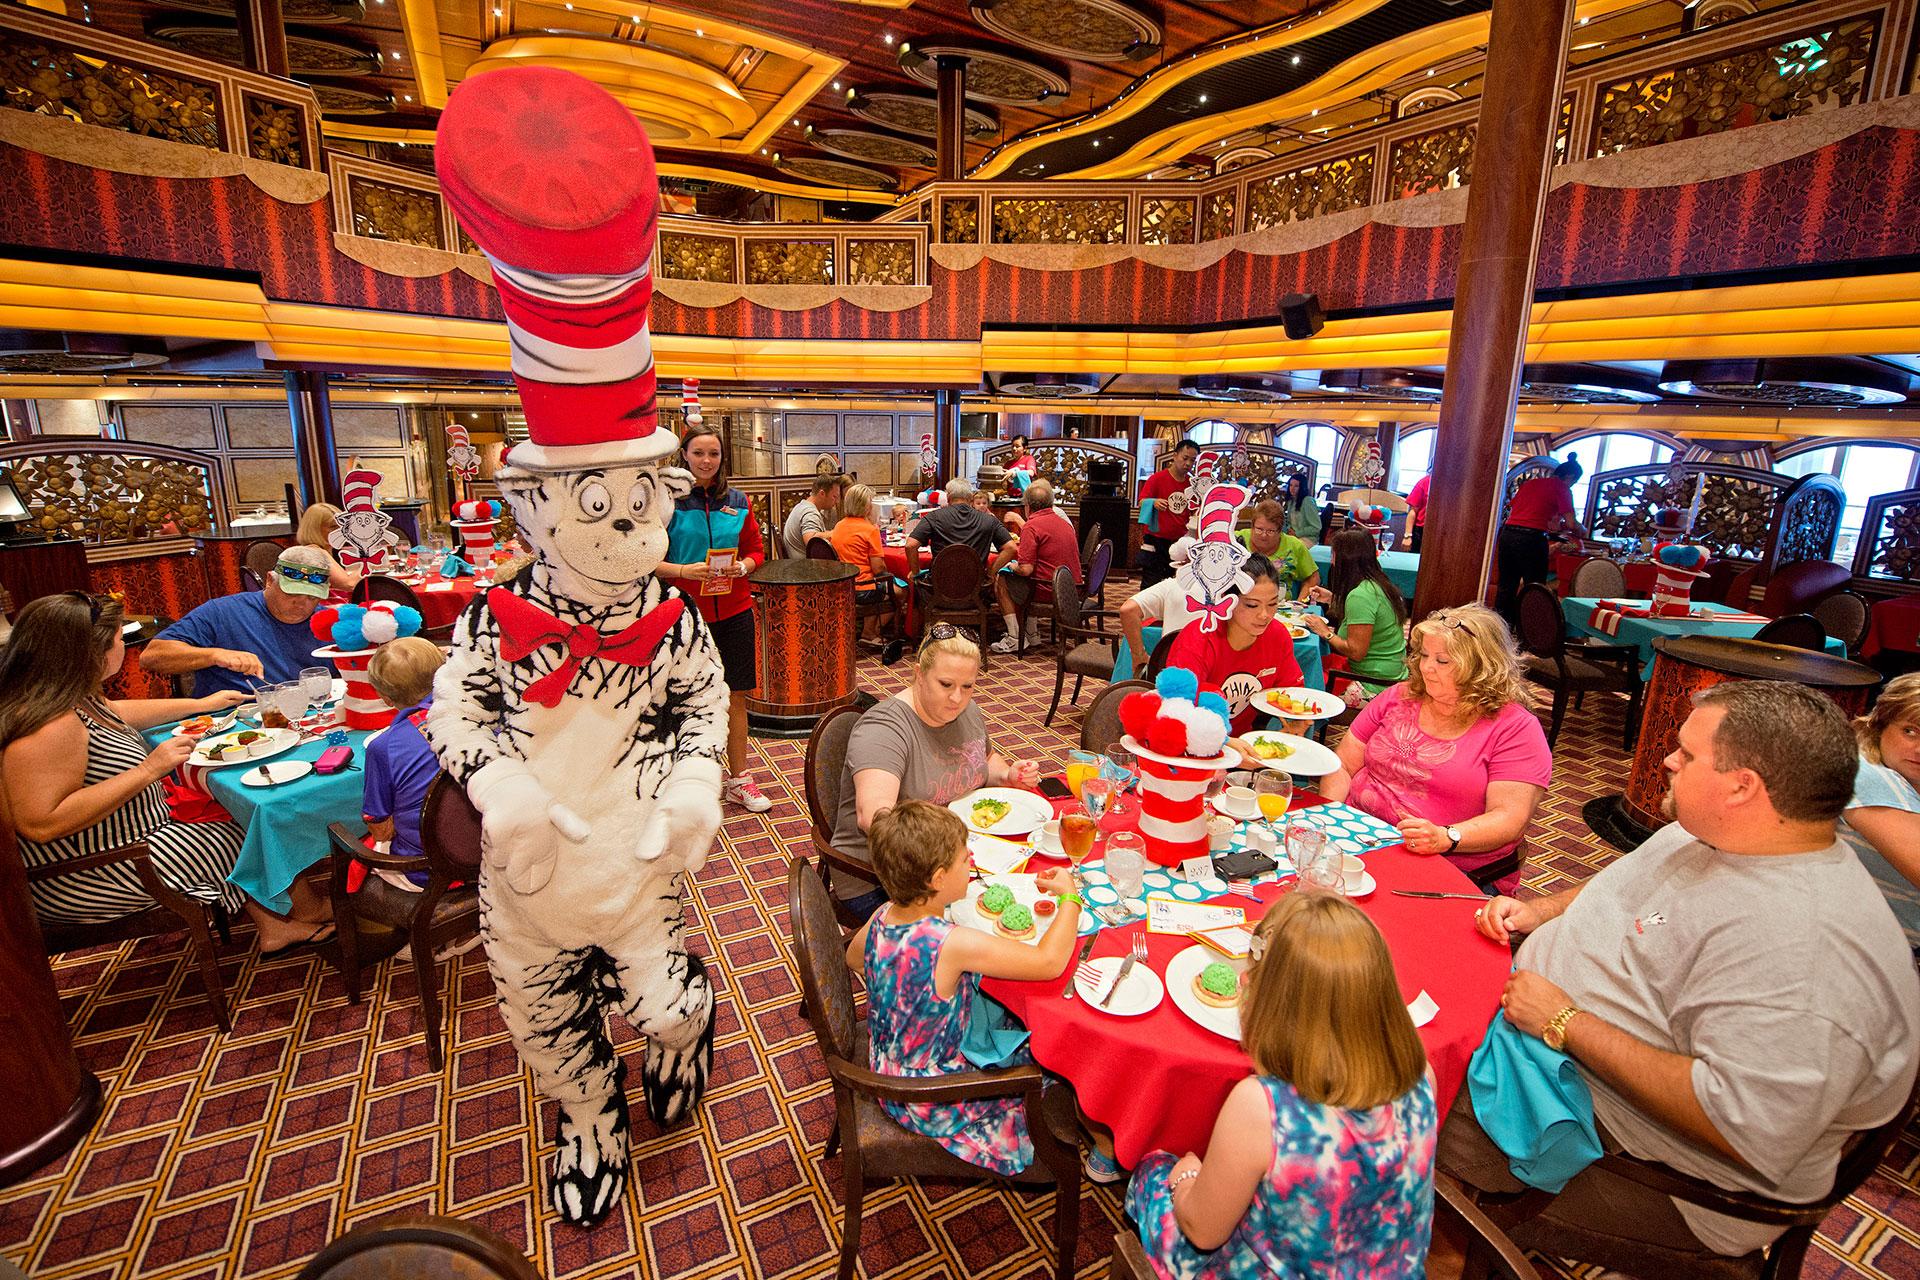 Seuss at Sea on Carnival Cruise Line' Courtesy of Carnival Cruise Line